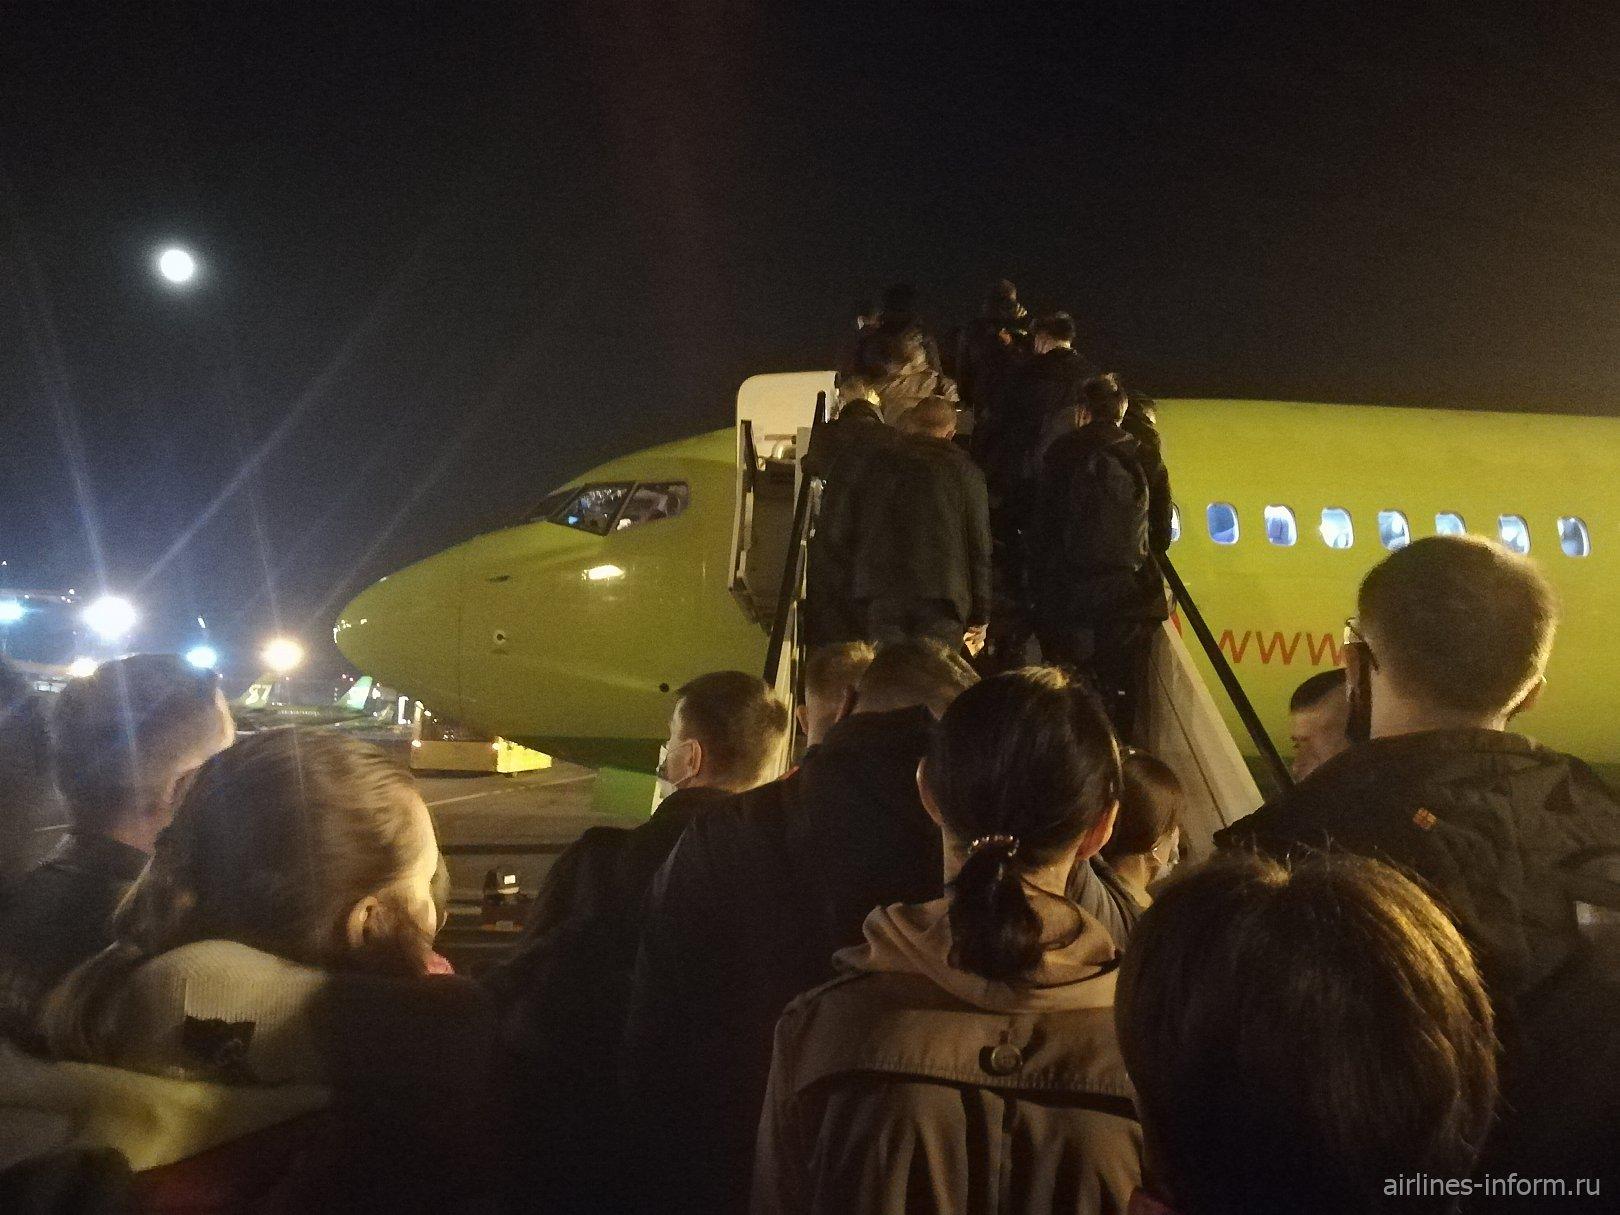 Новосибирск (Толмачево, им. Покрышкина, OVB) - Чита (Кадала, HTA) с S7 на B-737-800